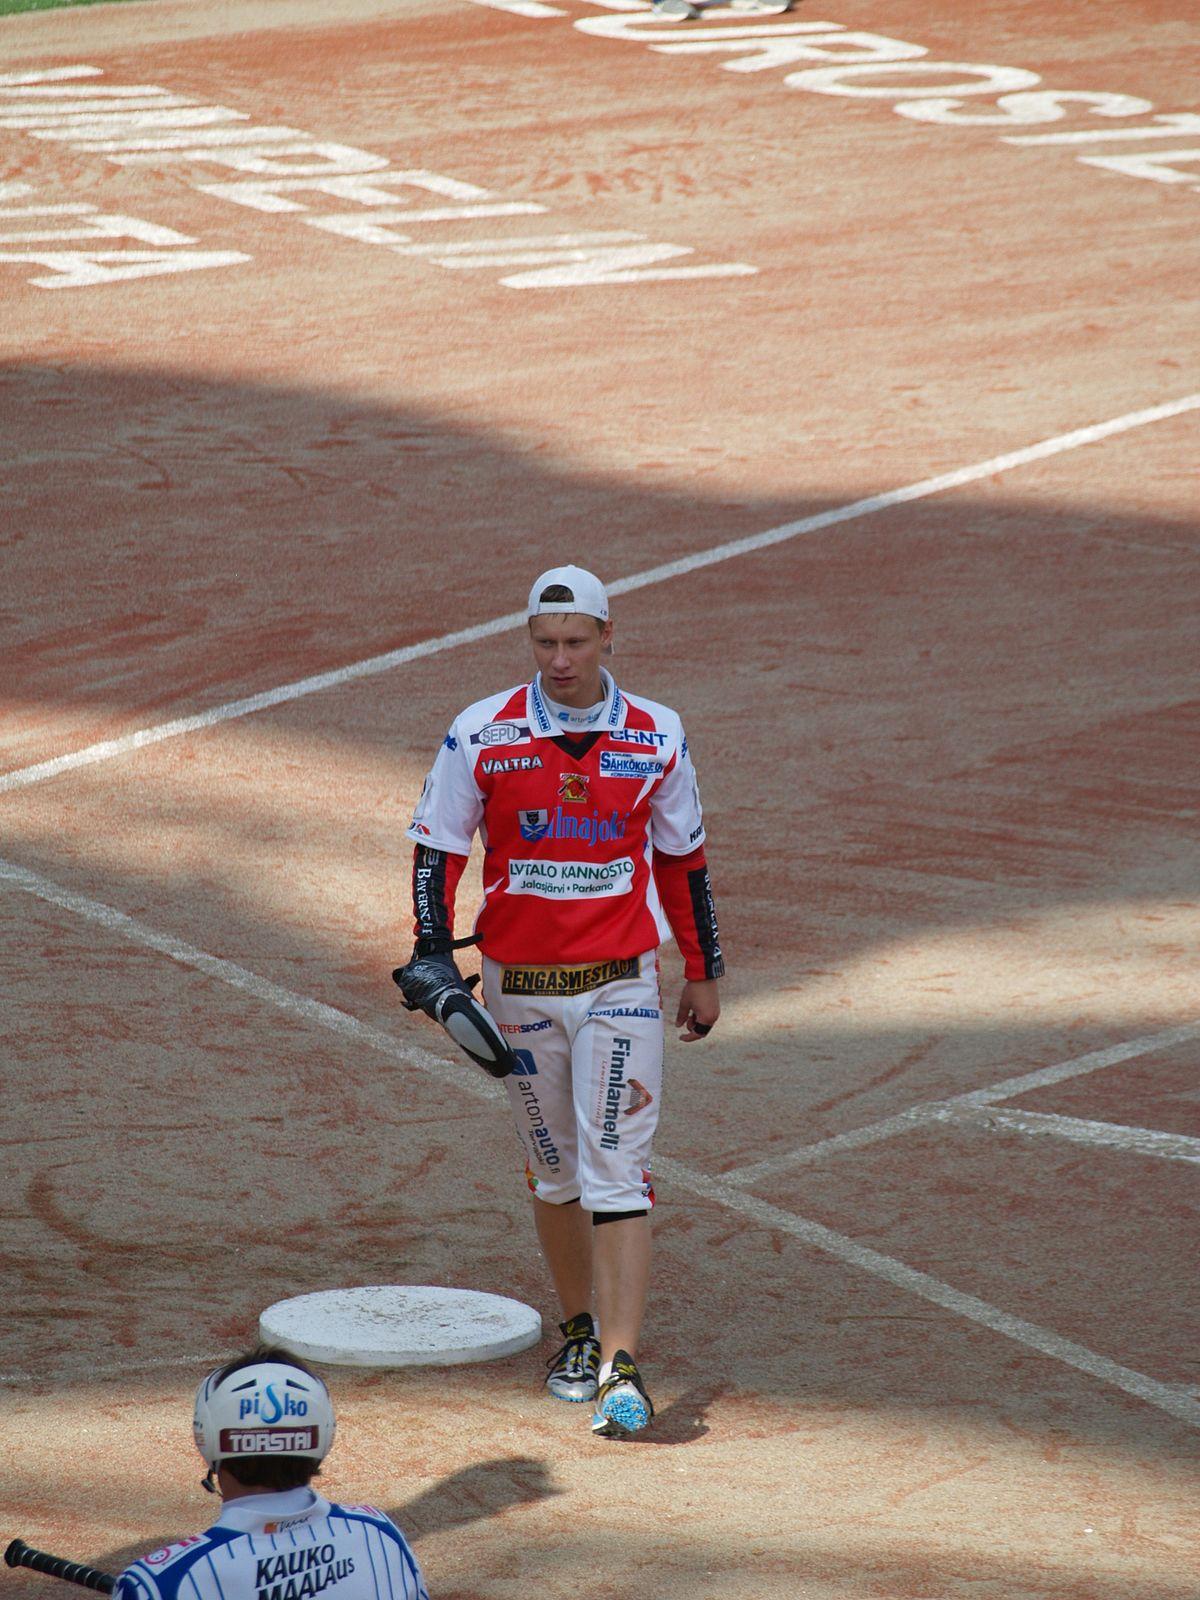 Henri Itävalo